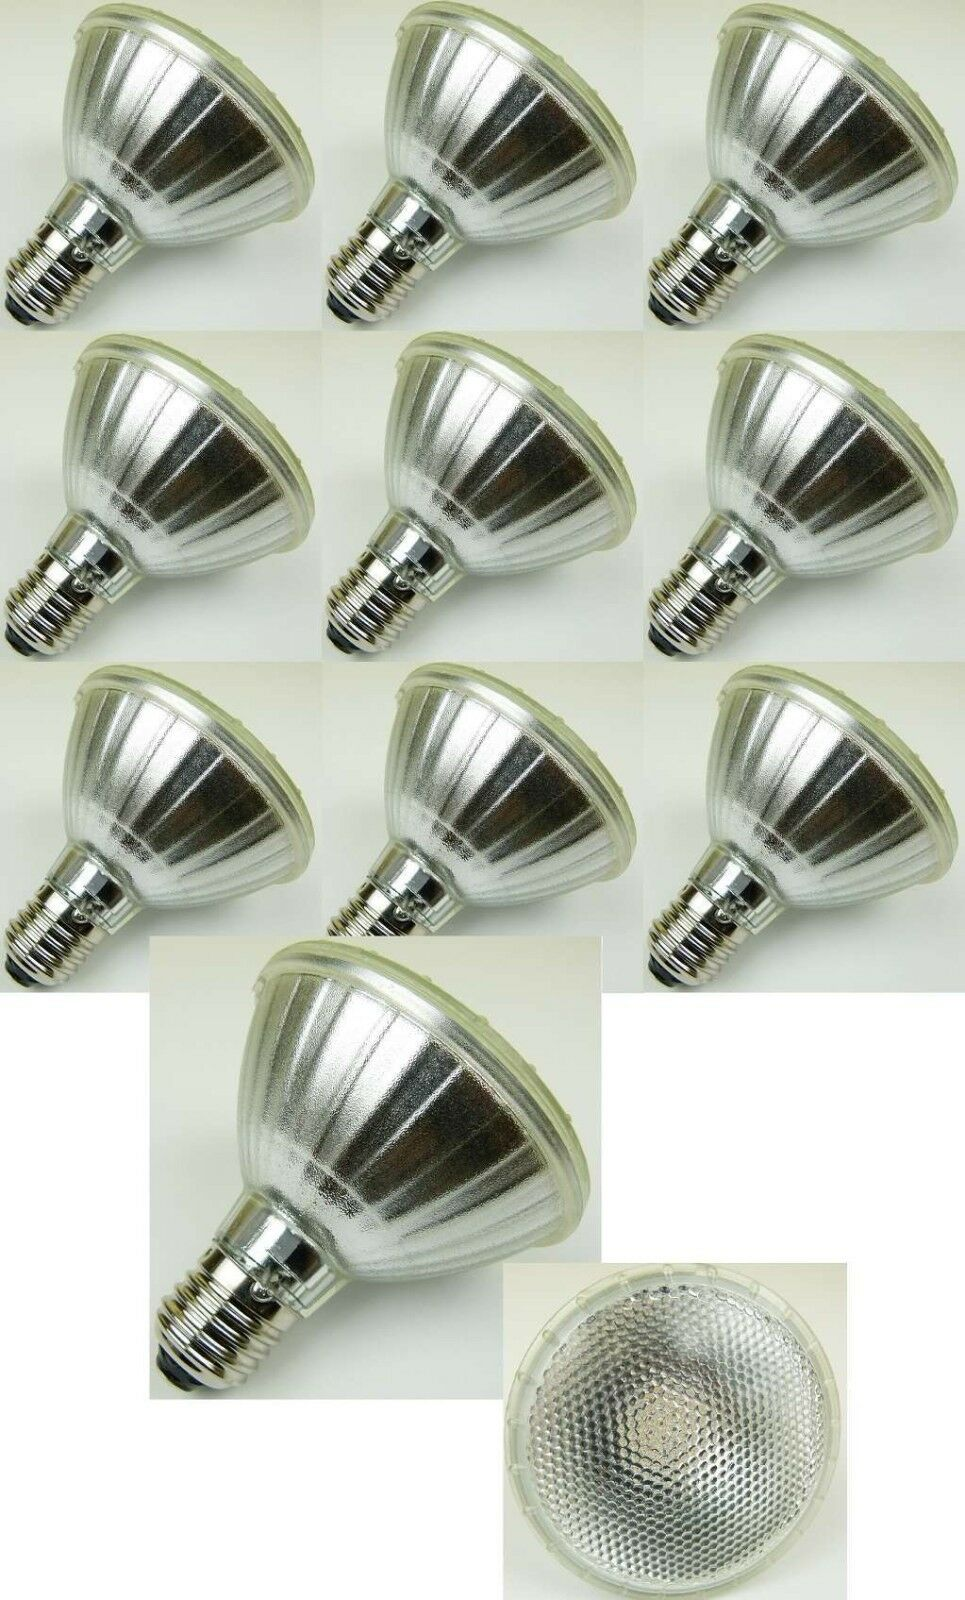 10 x OMNILUX PAR 30 LED Spot 11W 230V E27 6500K kaltweiß Leuchte Strahler Lampe